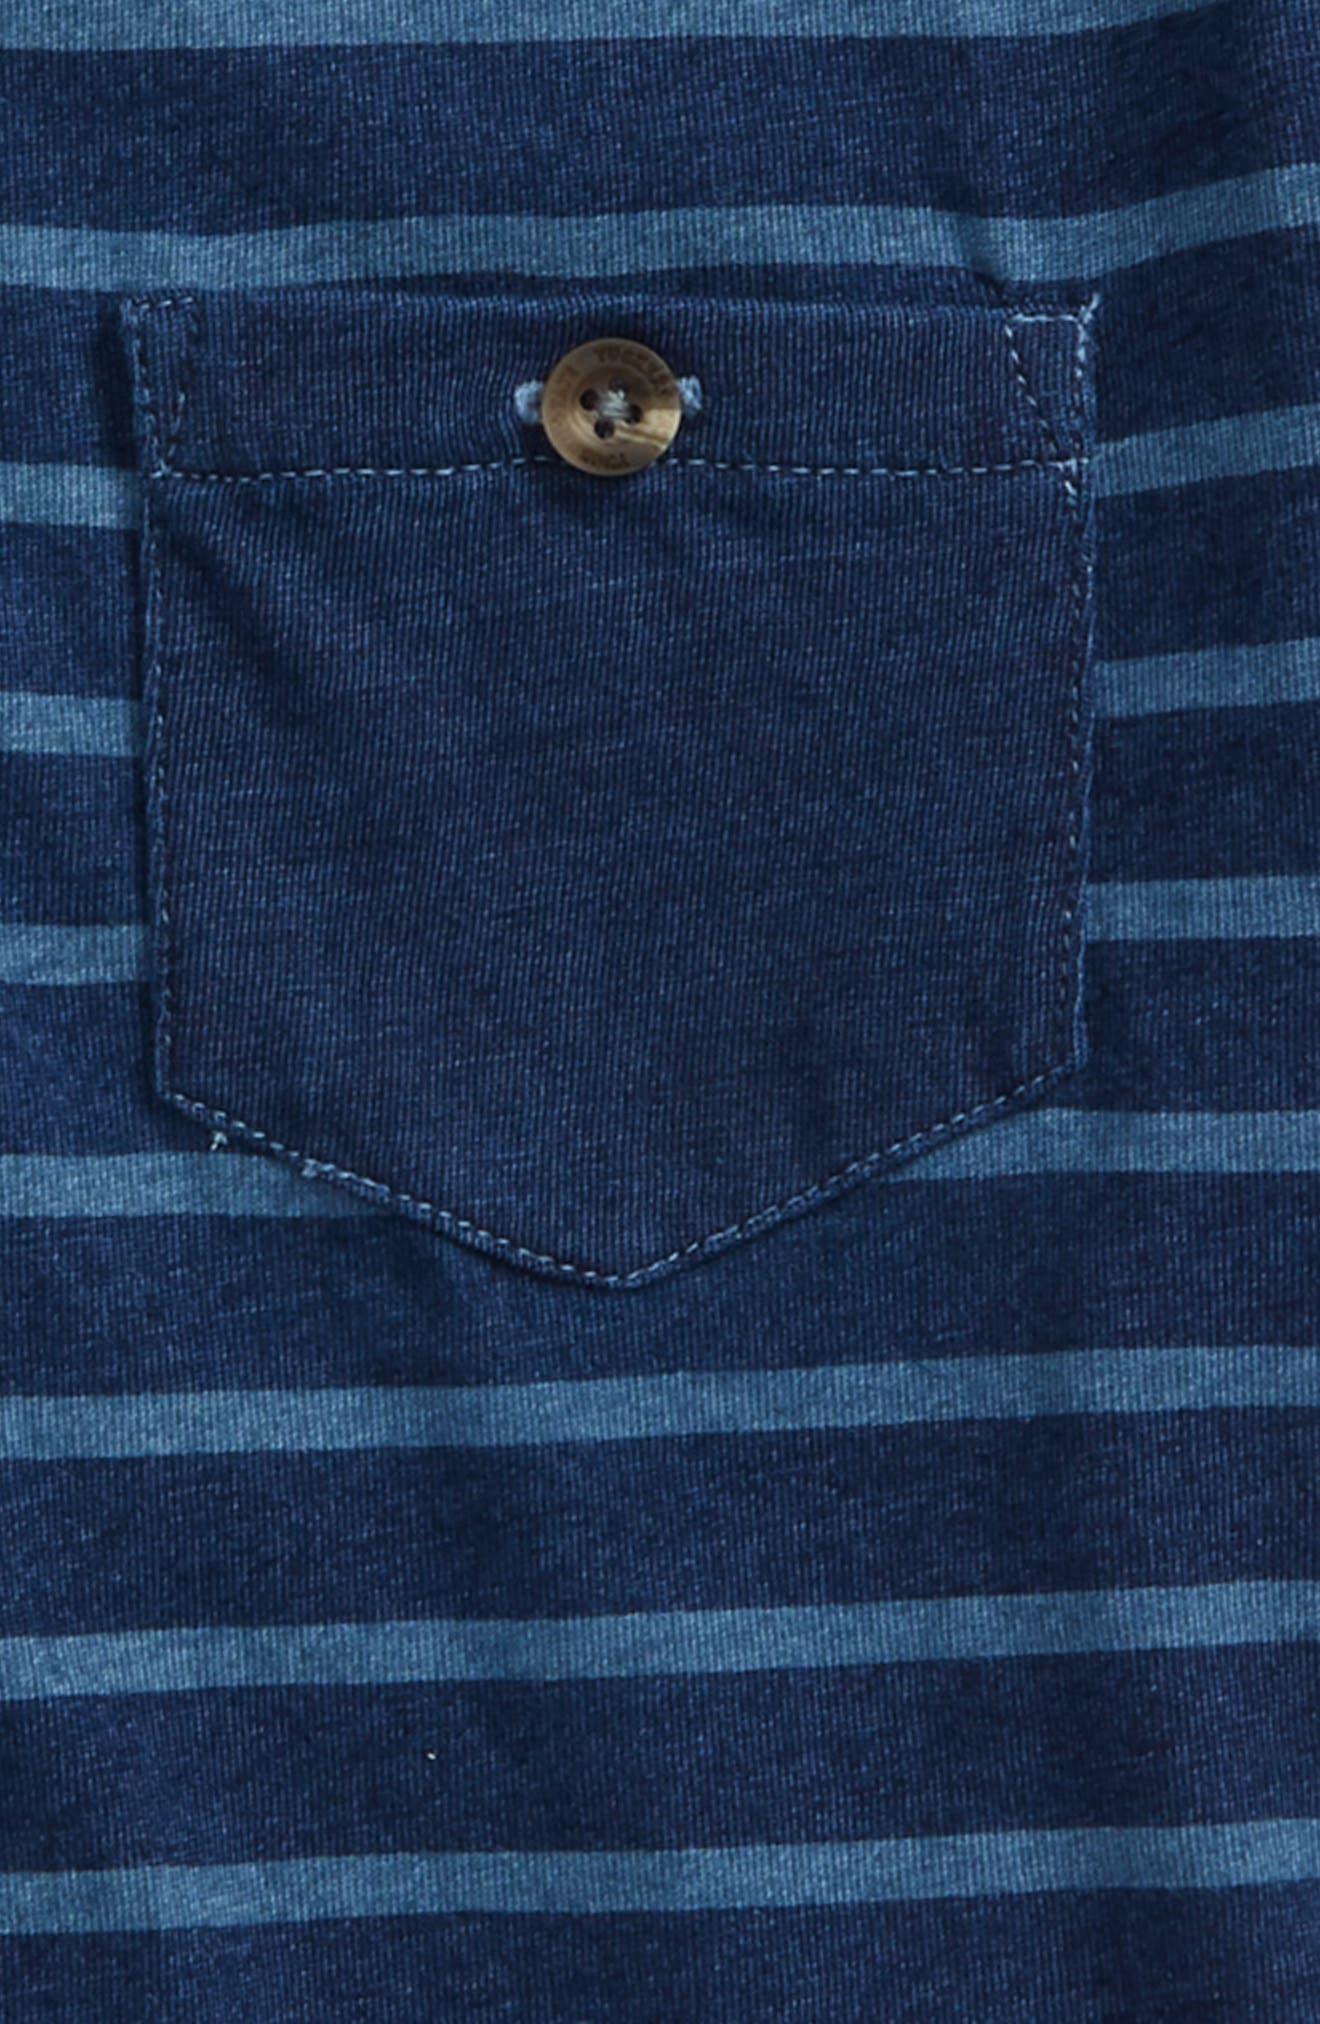 Stripe Polo,                             Alternate thumbnail 2, color,                             Navy Denim Stripe